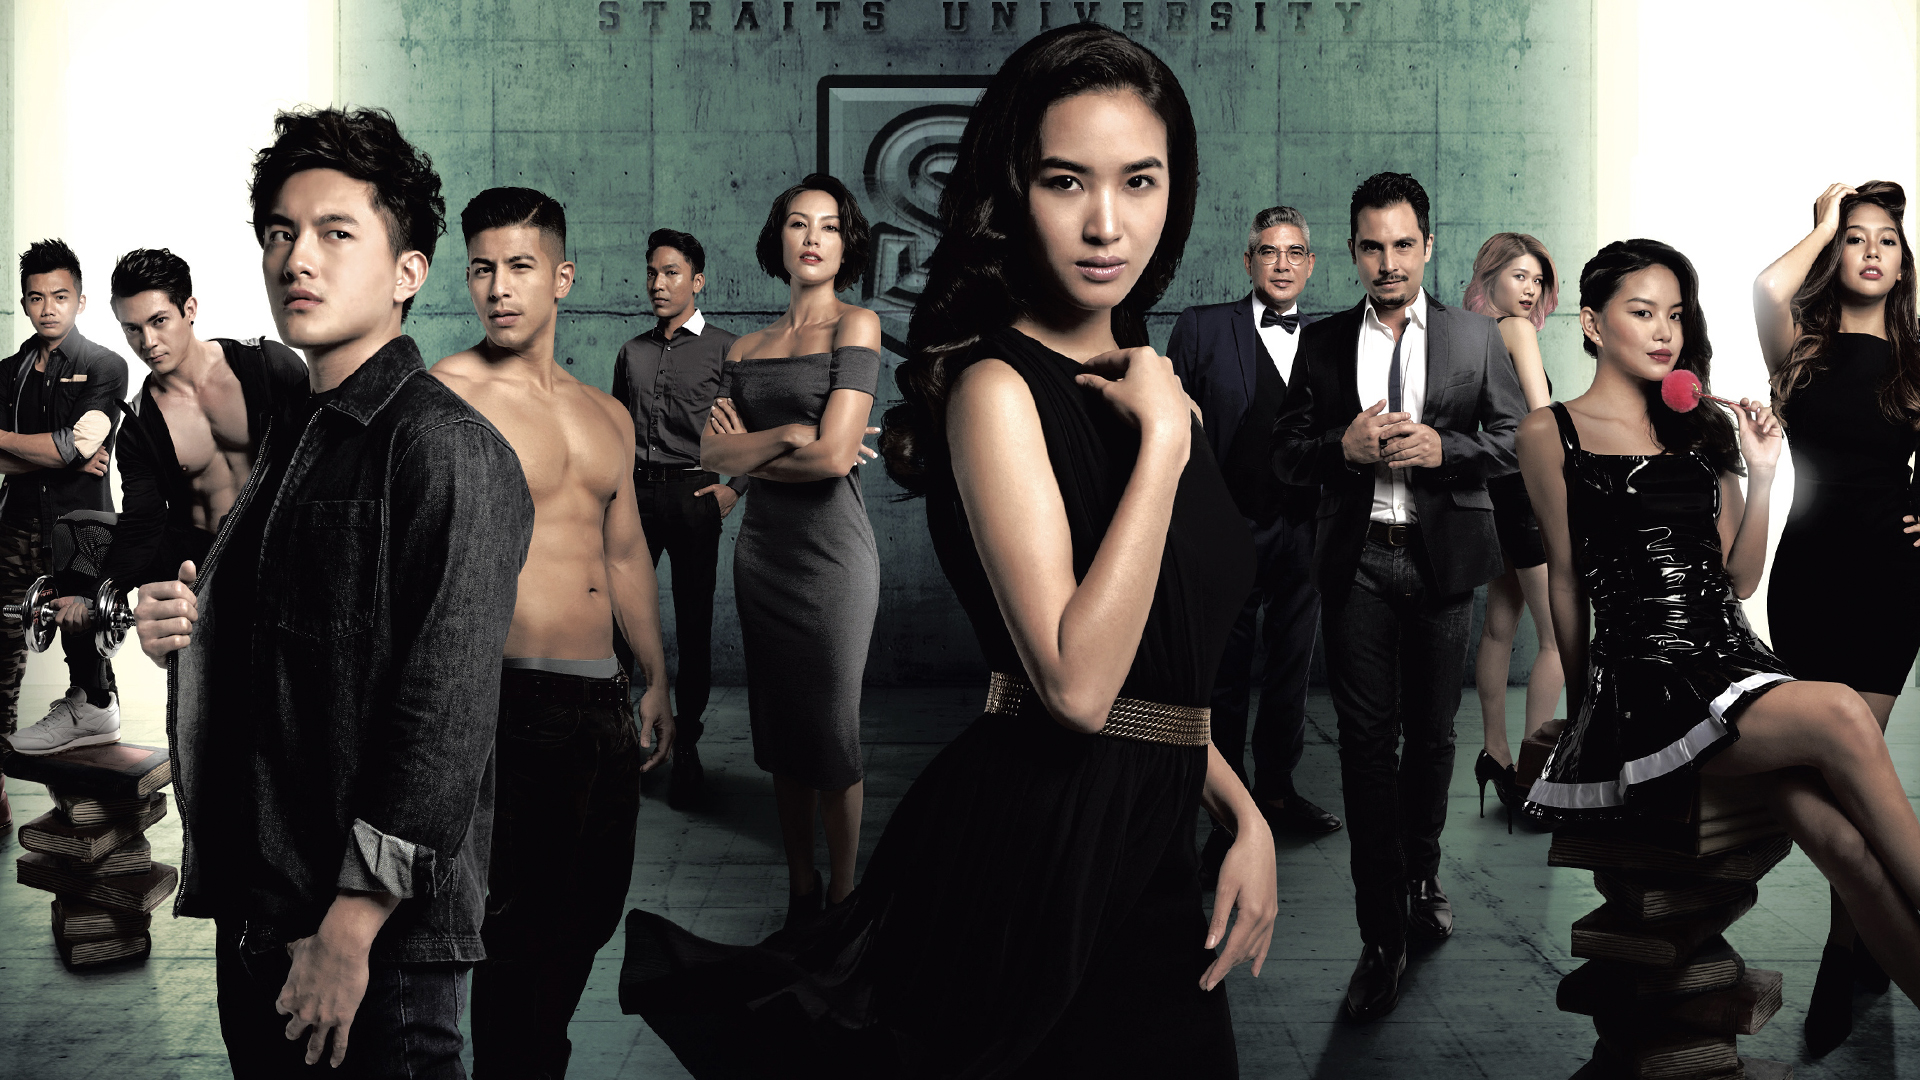 Faculty - Season 1